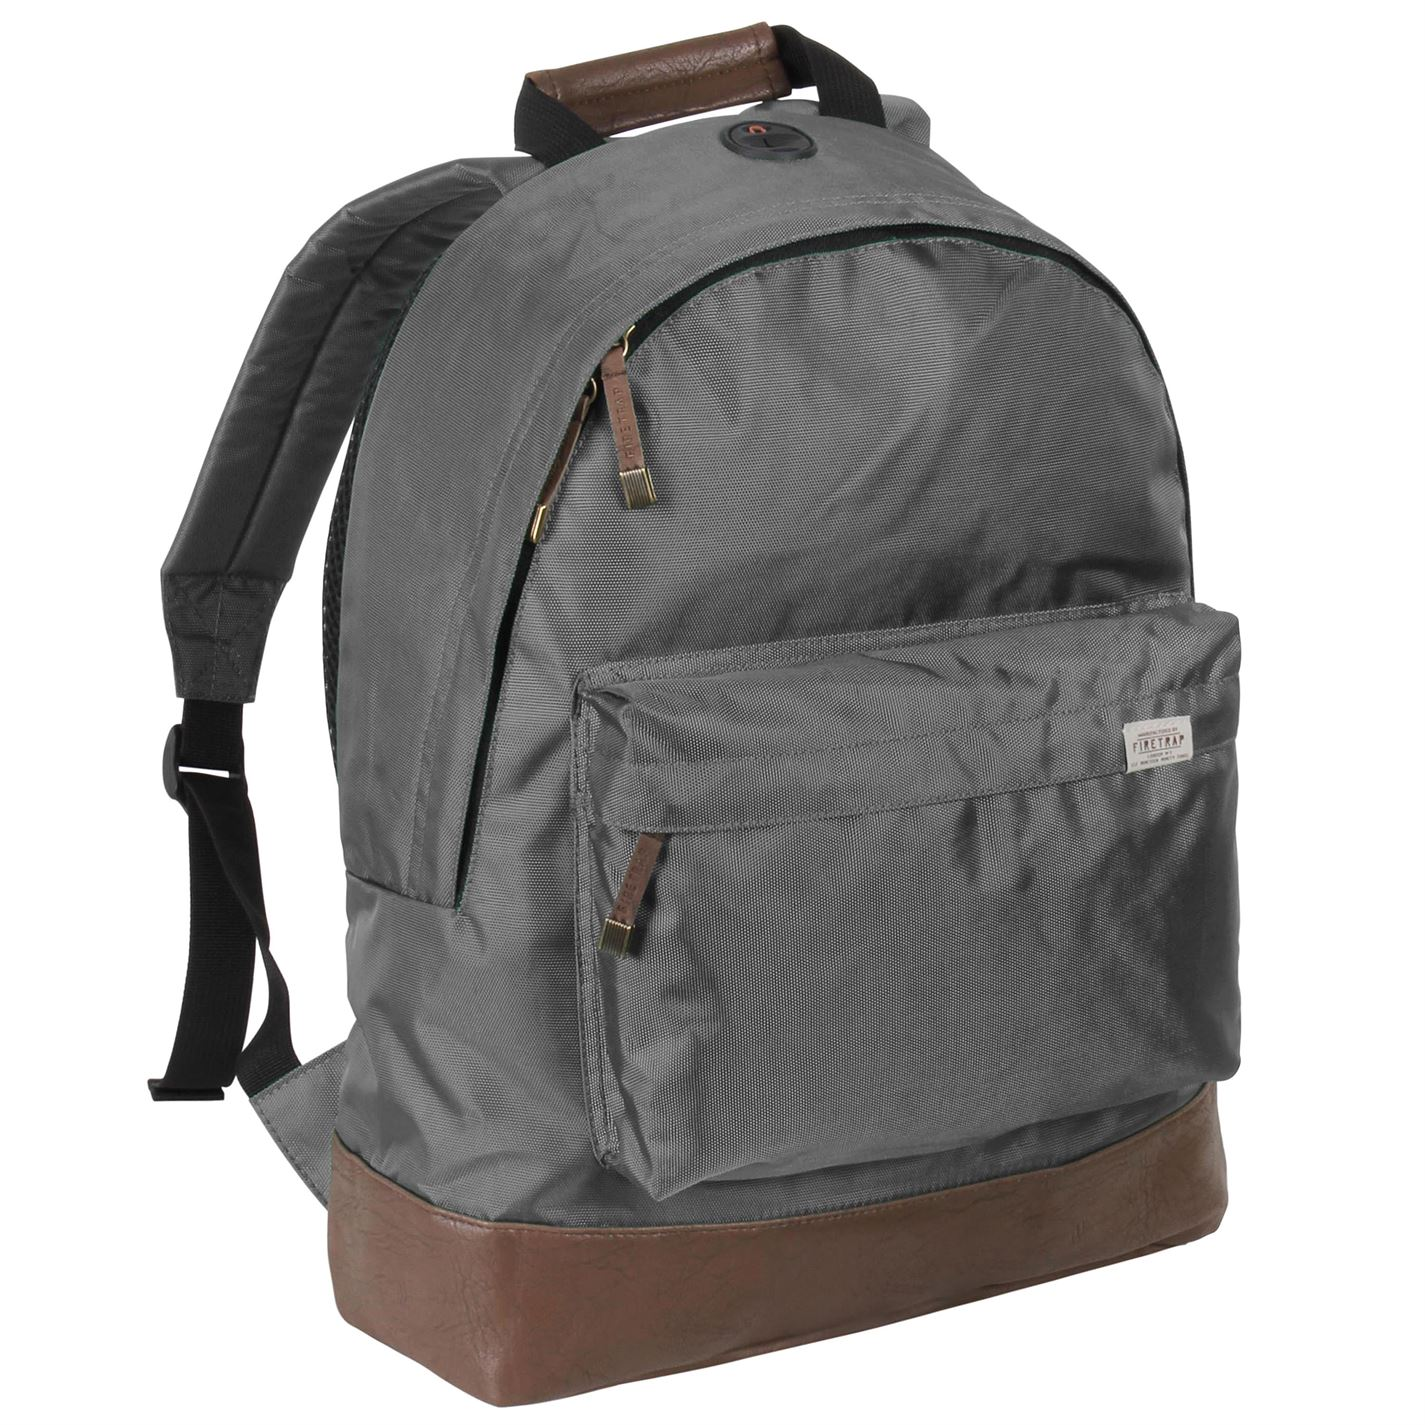 Batoh Firetrap Classic Back Pack - Glami.cz 8cbe6bcebe